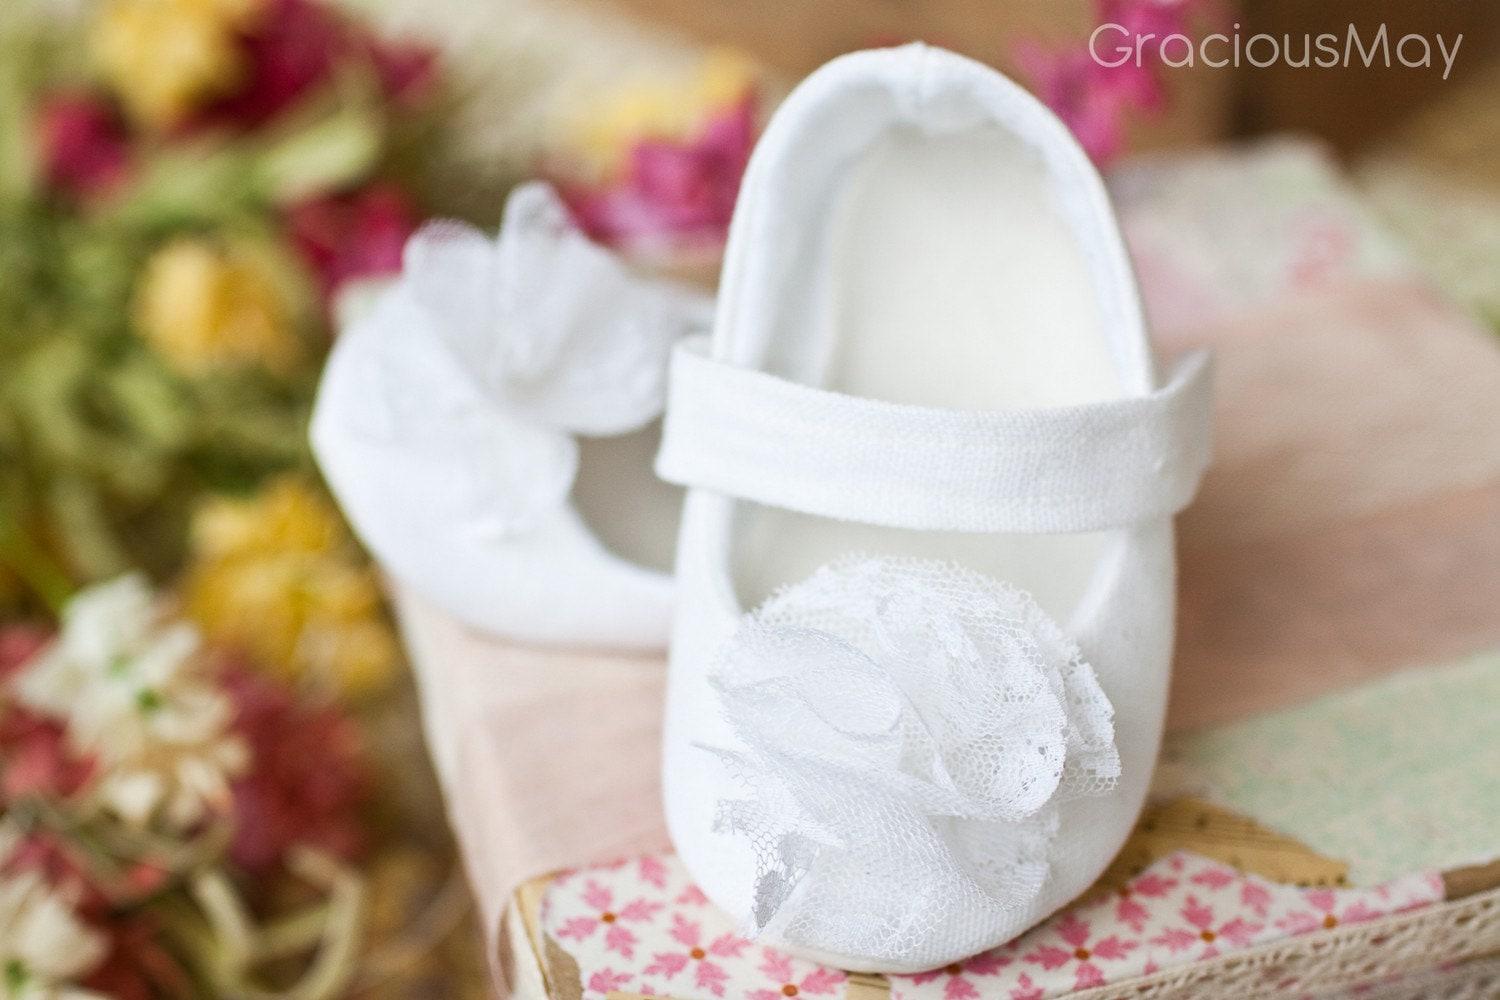 викторианский maryjane кружева - Свадебные